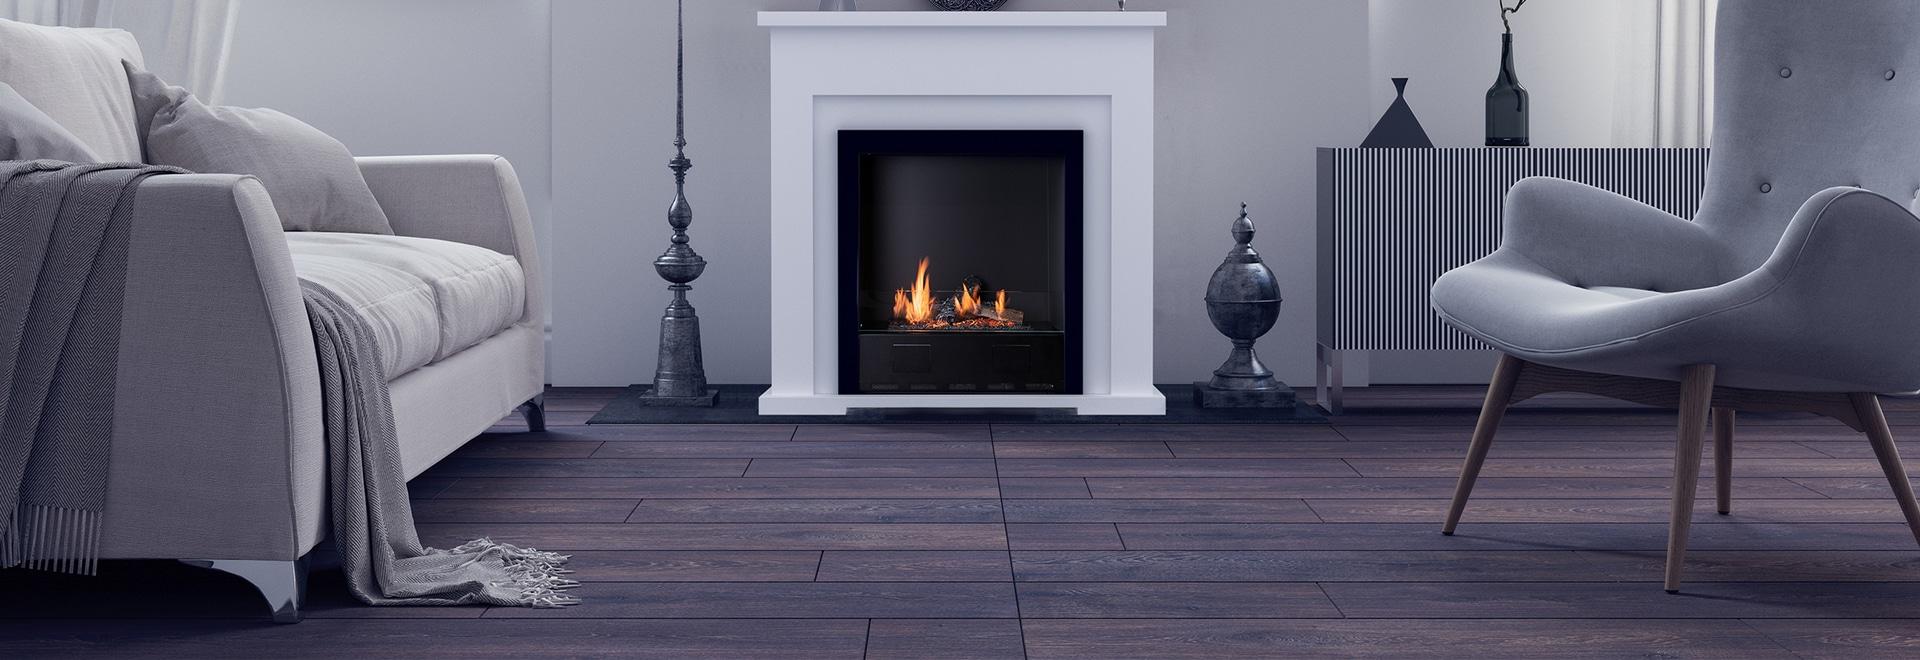 Traditional bio ethanol fireplace.